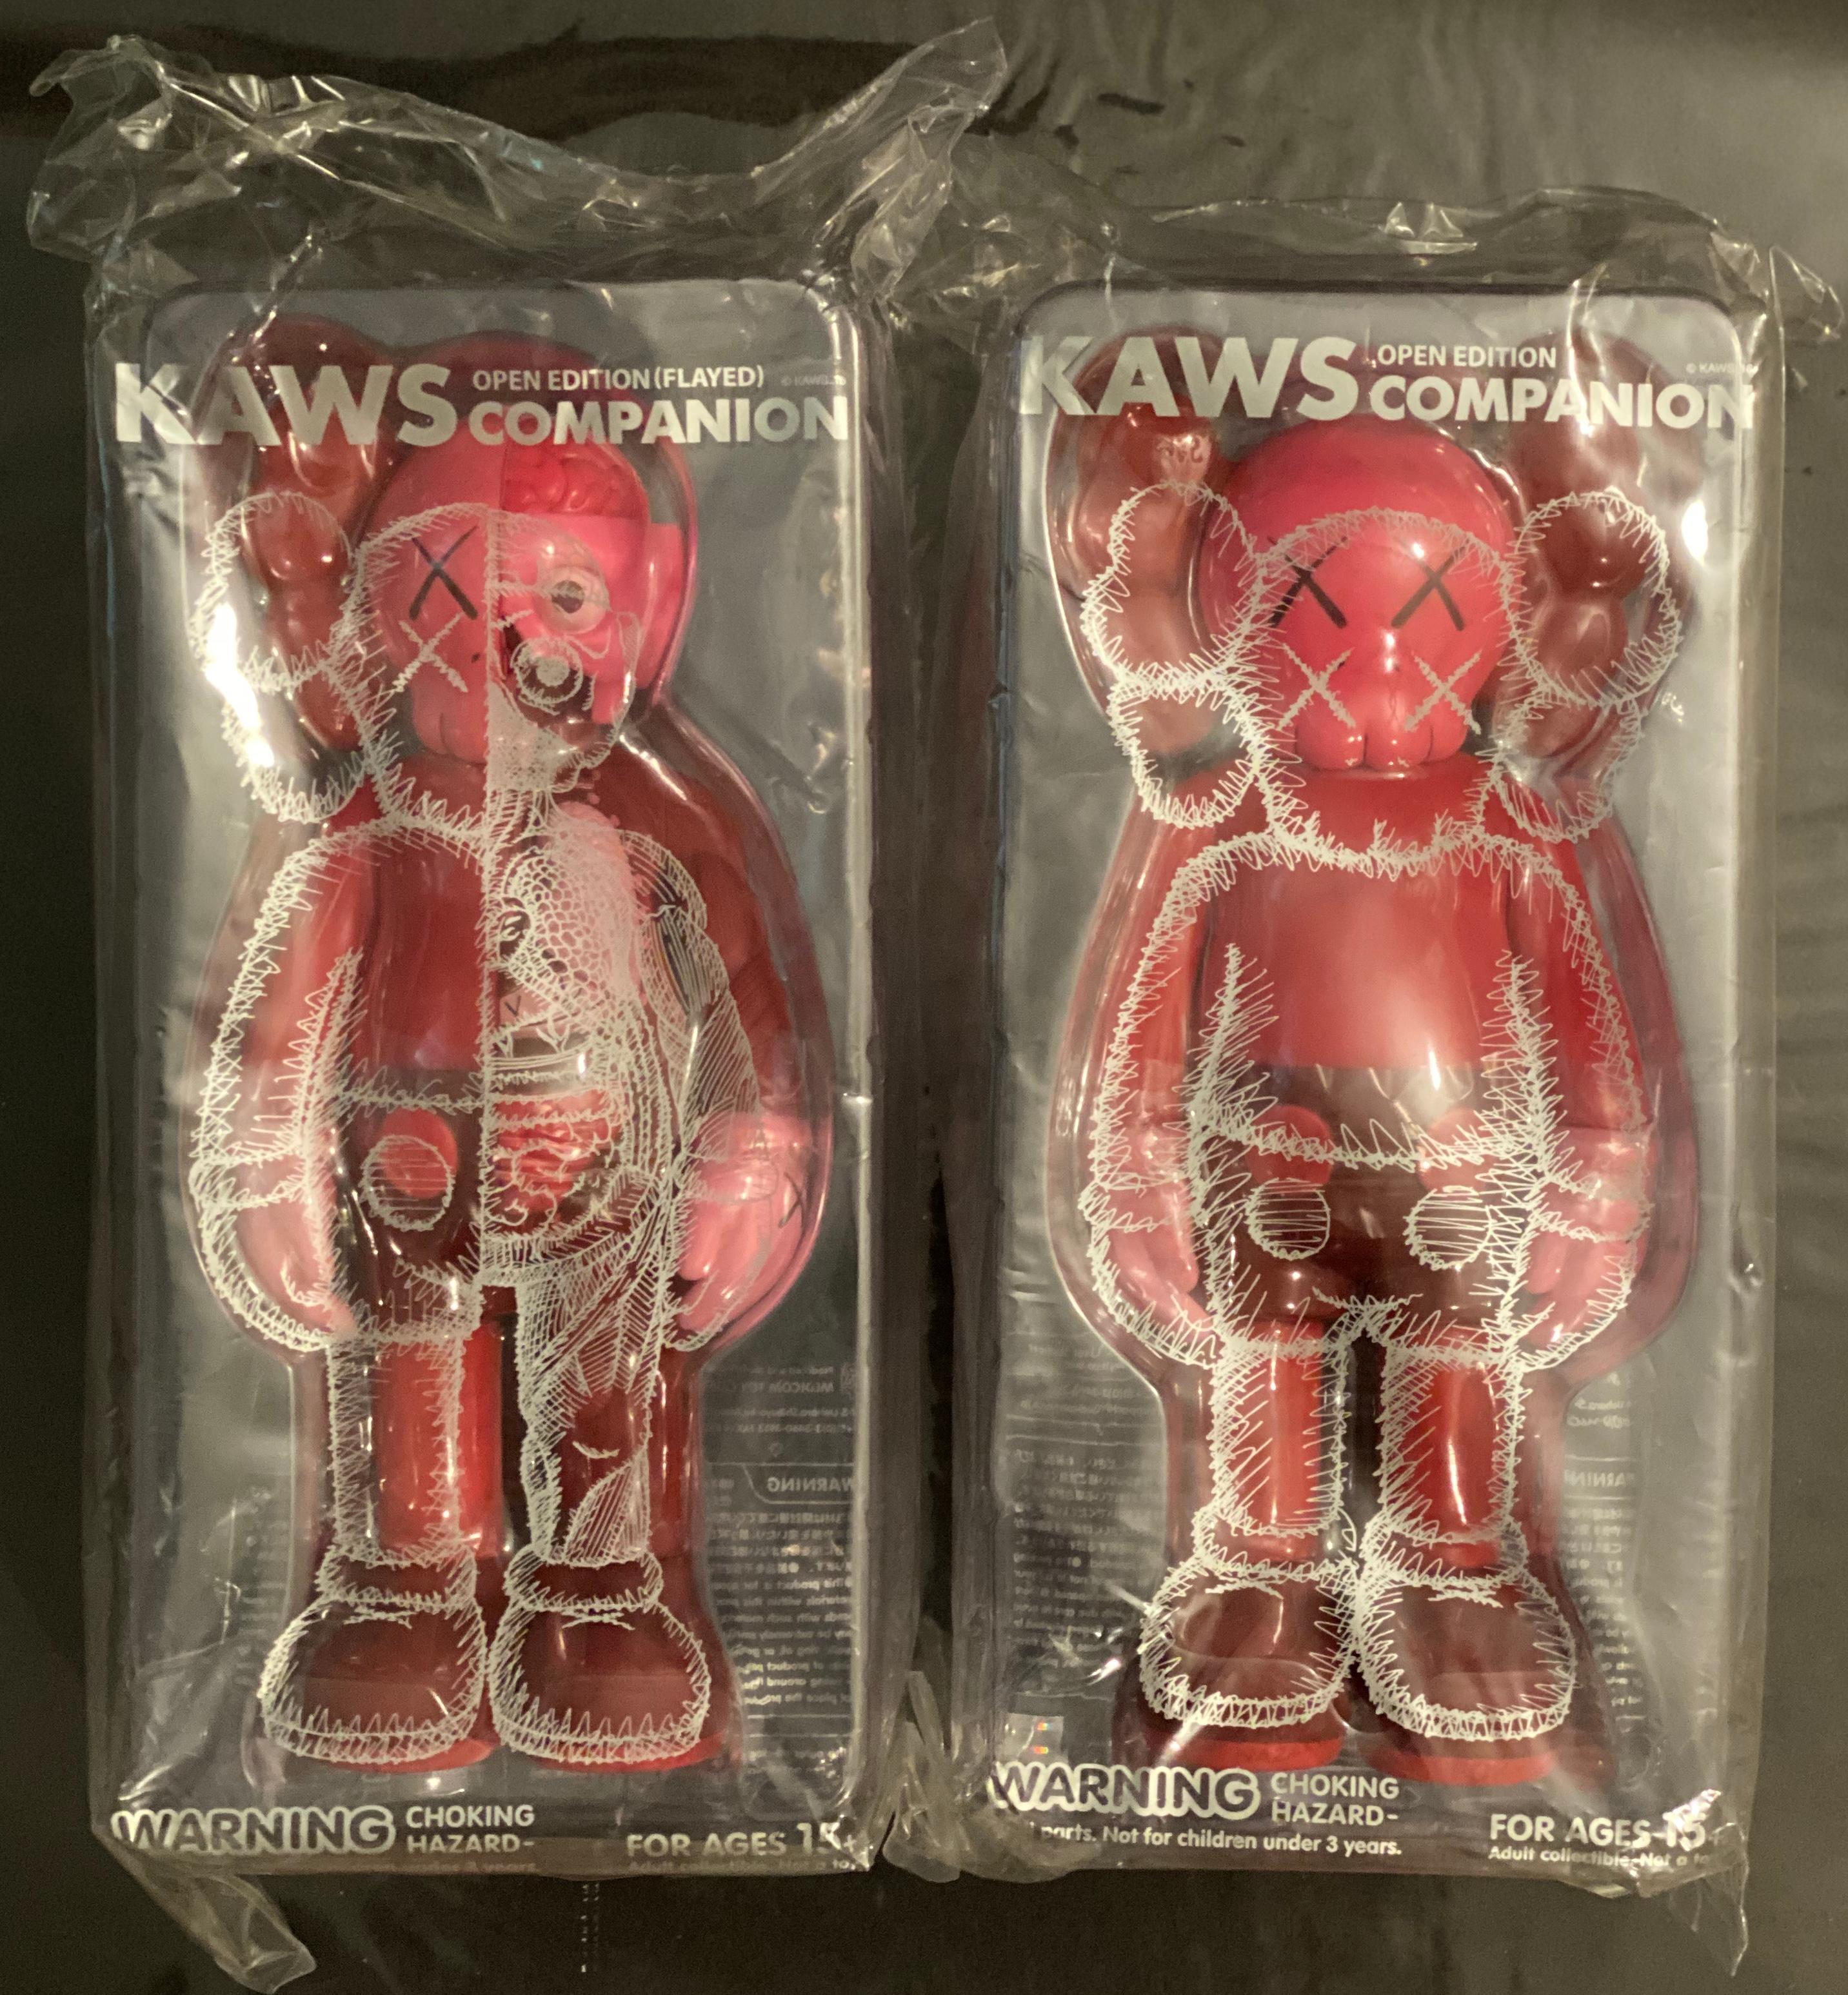 Kaws Blush Set Flayed & Companion YUZ Museum China Decorative Figures Pop Urban